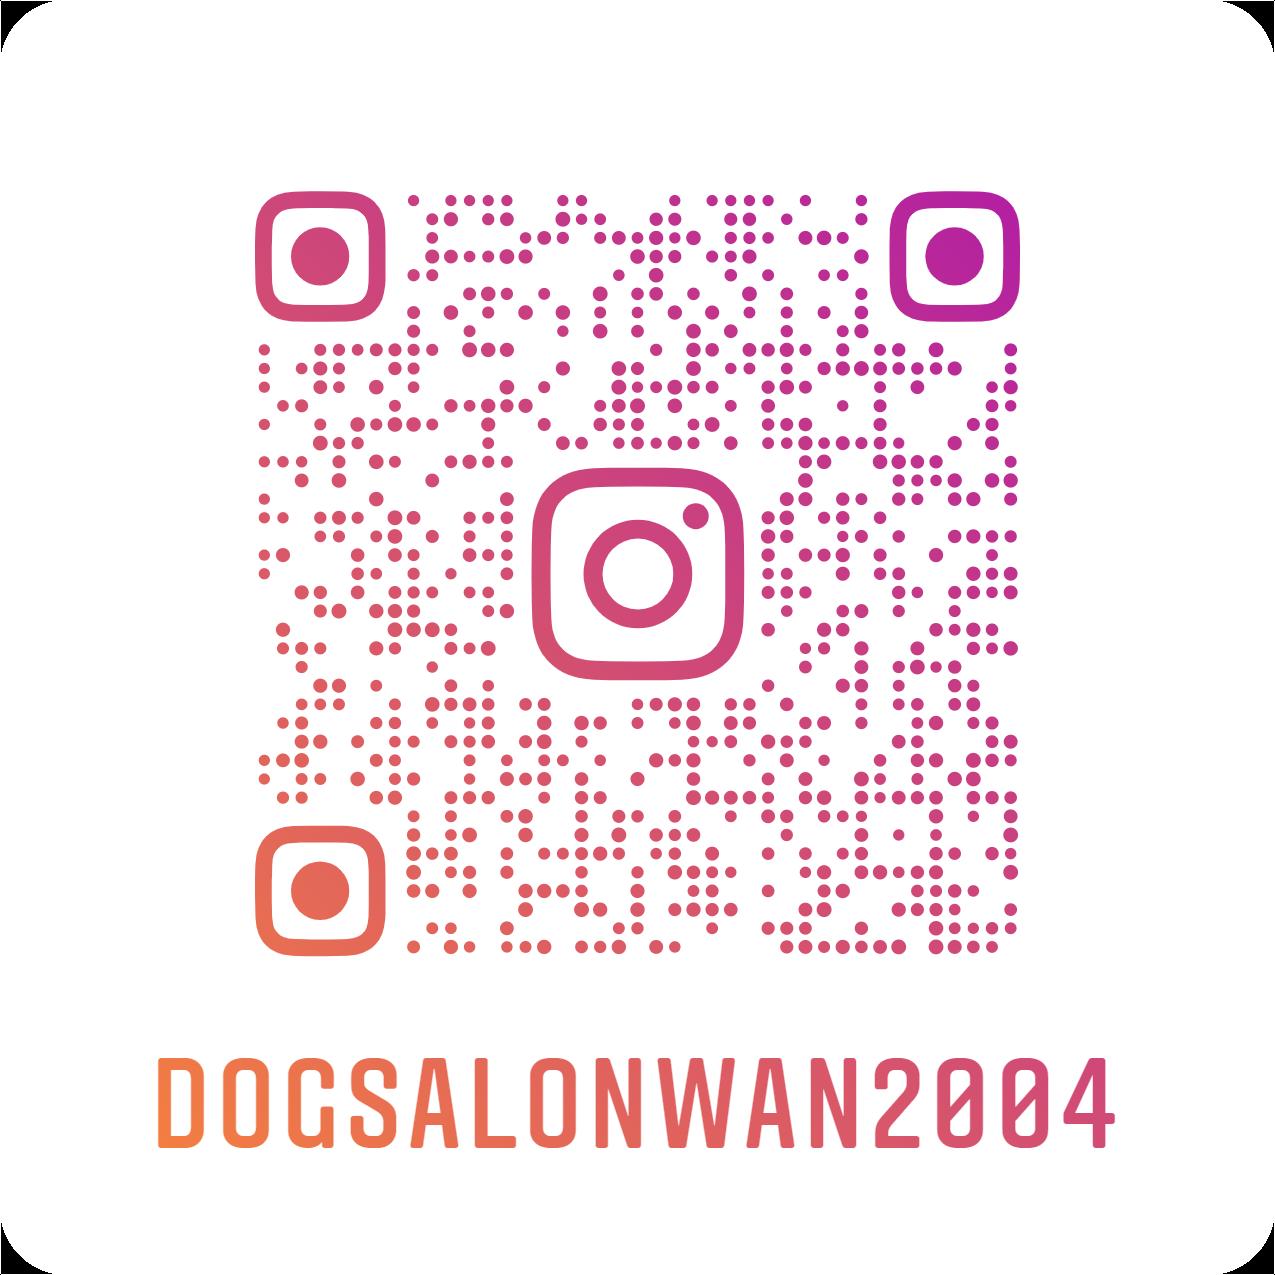 dogsalonwan2004_nametag_2021082913253586e_20211017153733f6a.png